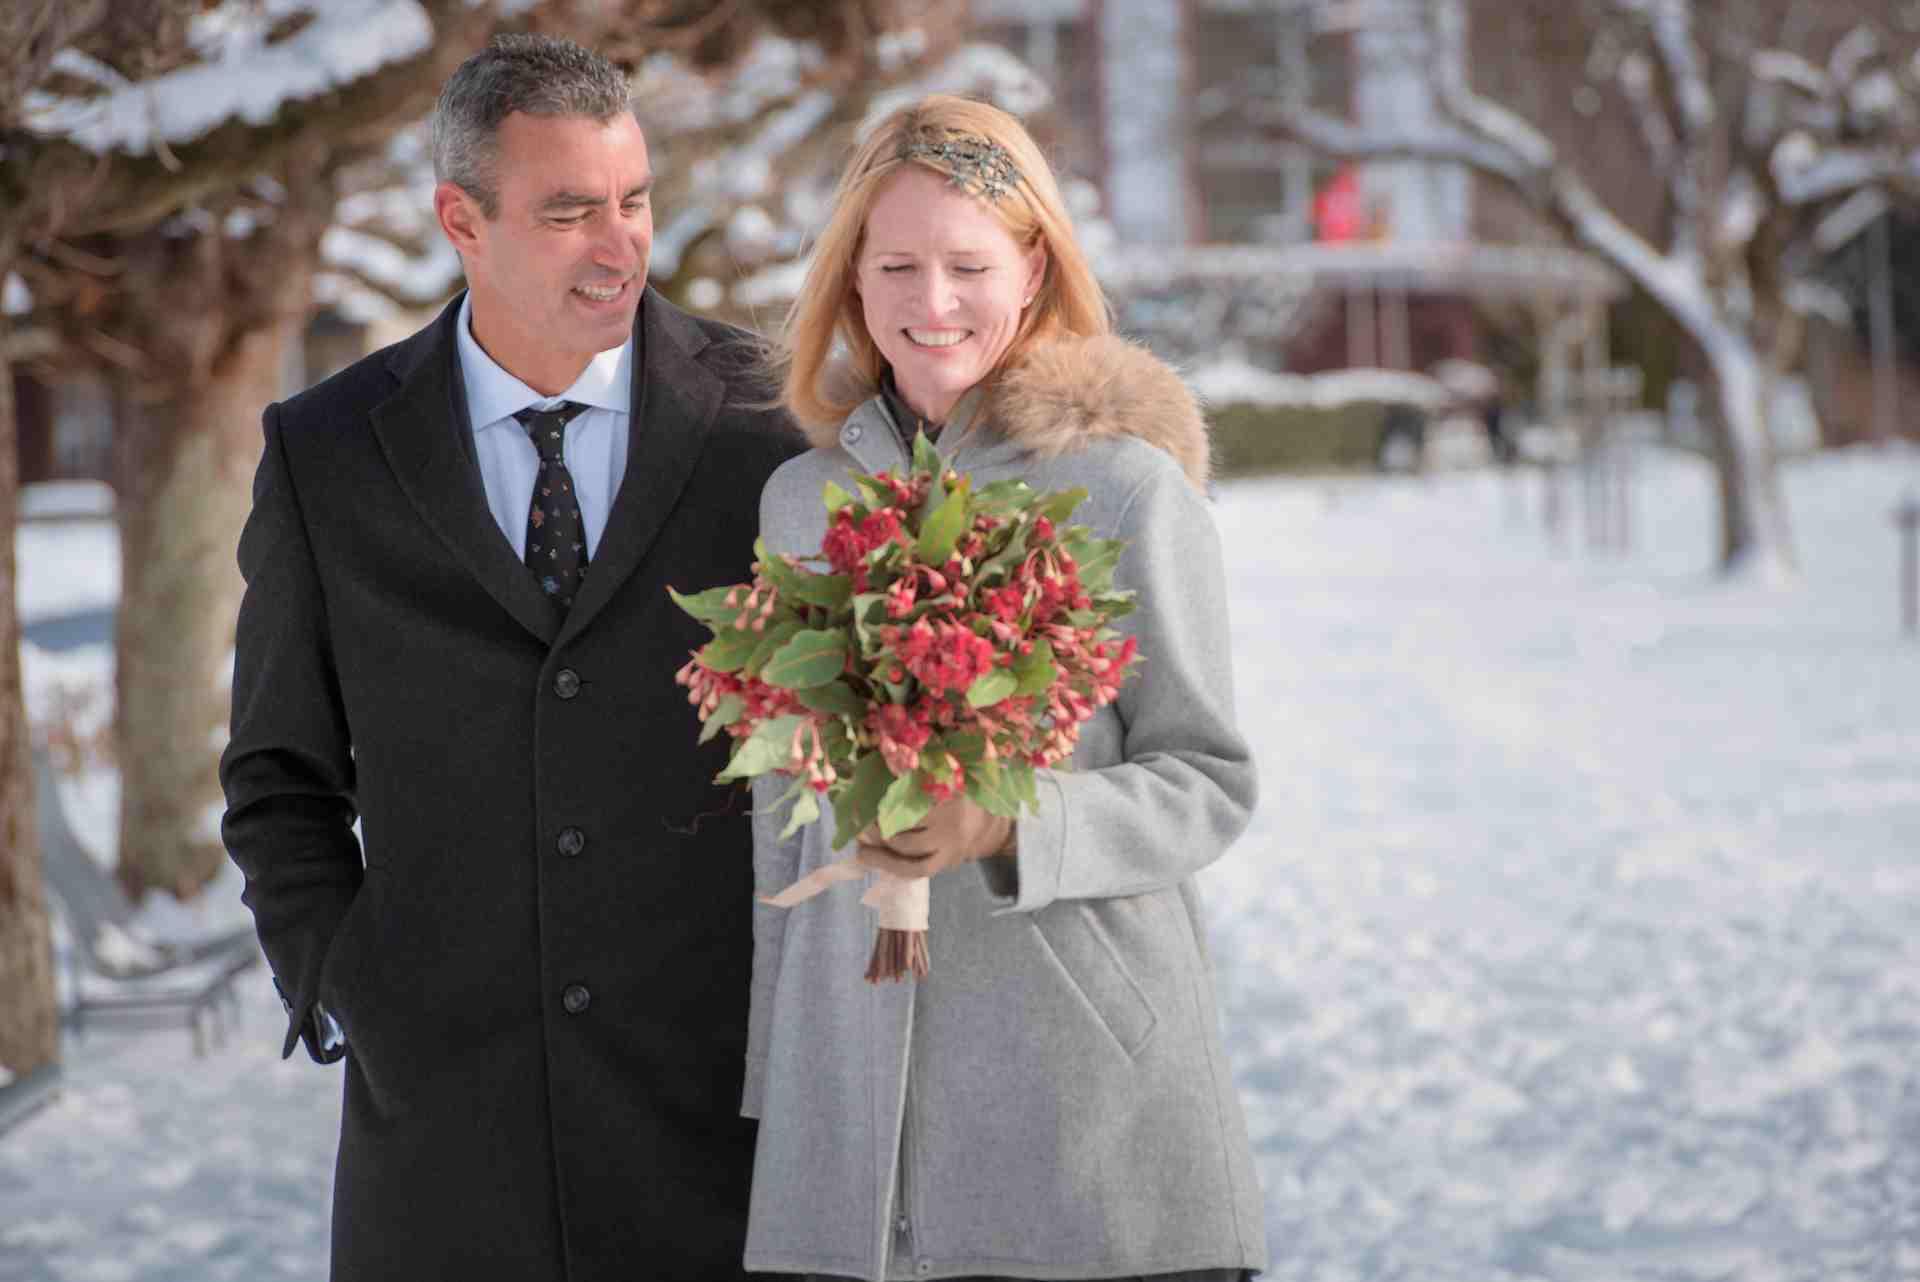 photographer Australian wedding Interlaken Switzerland